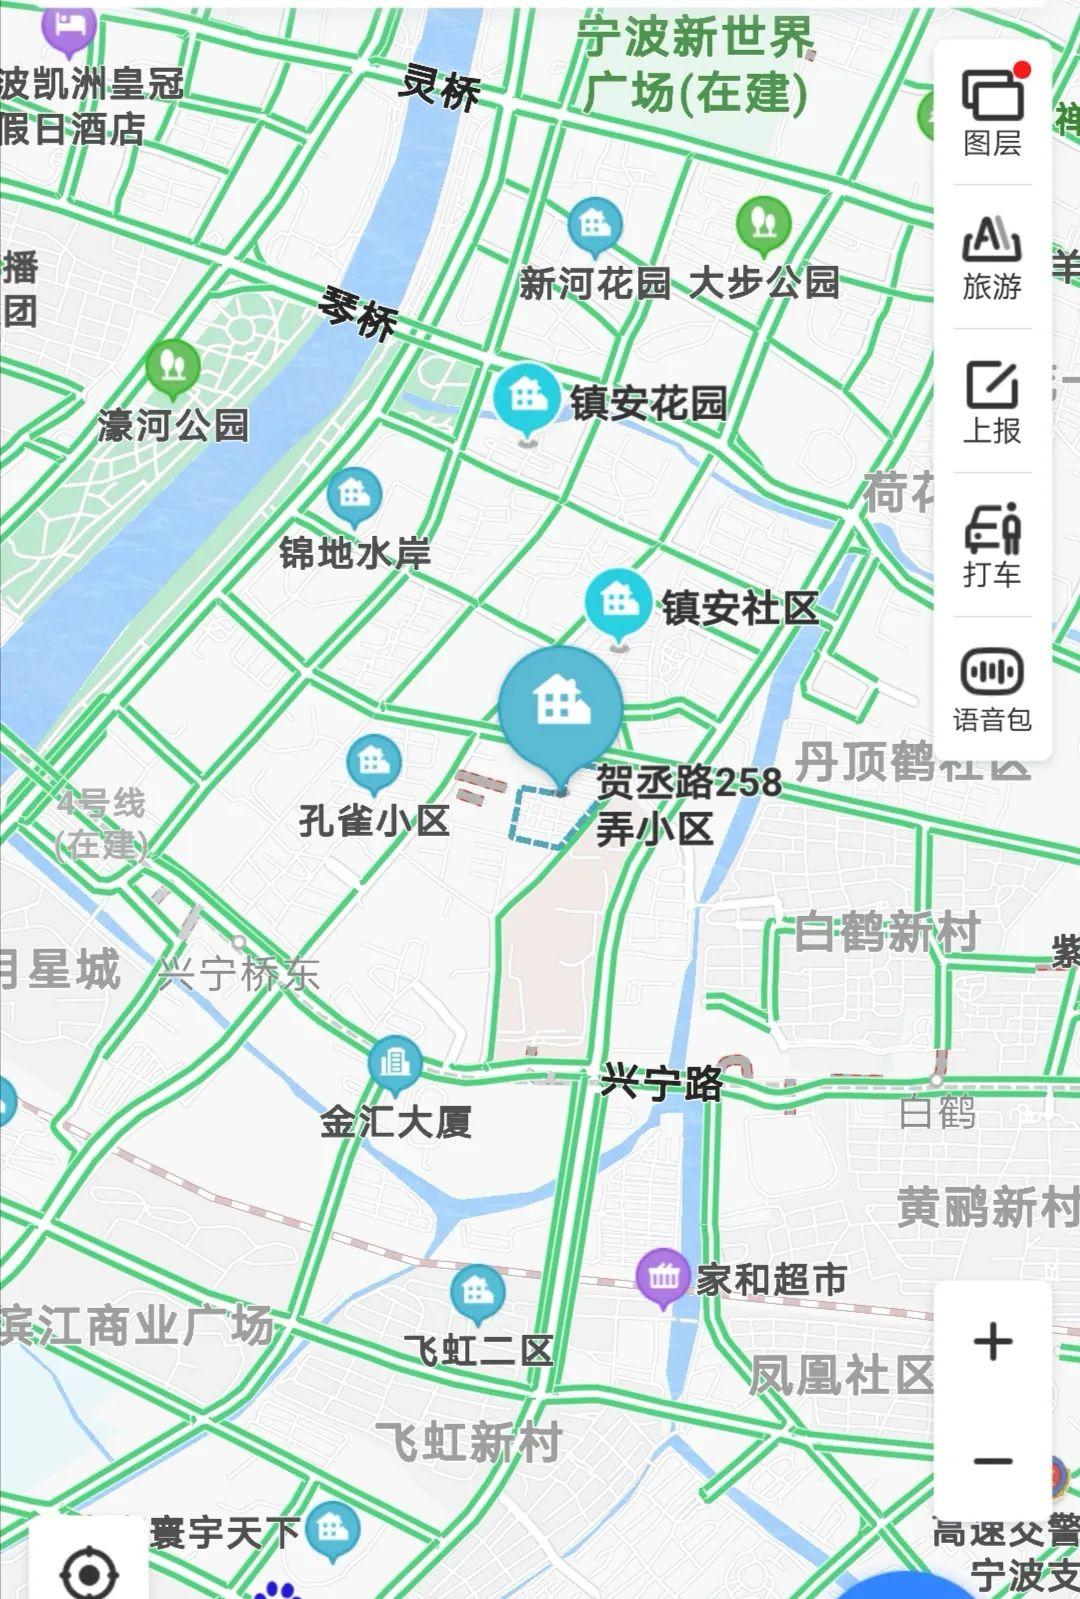 http://www.ncsnb.com/ningbofangchan/50091.html